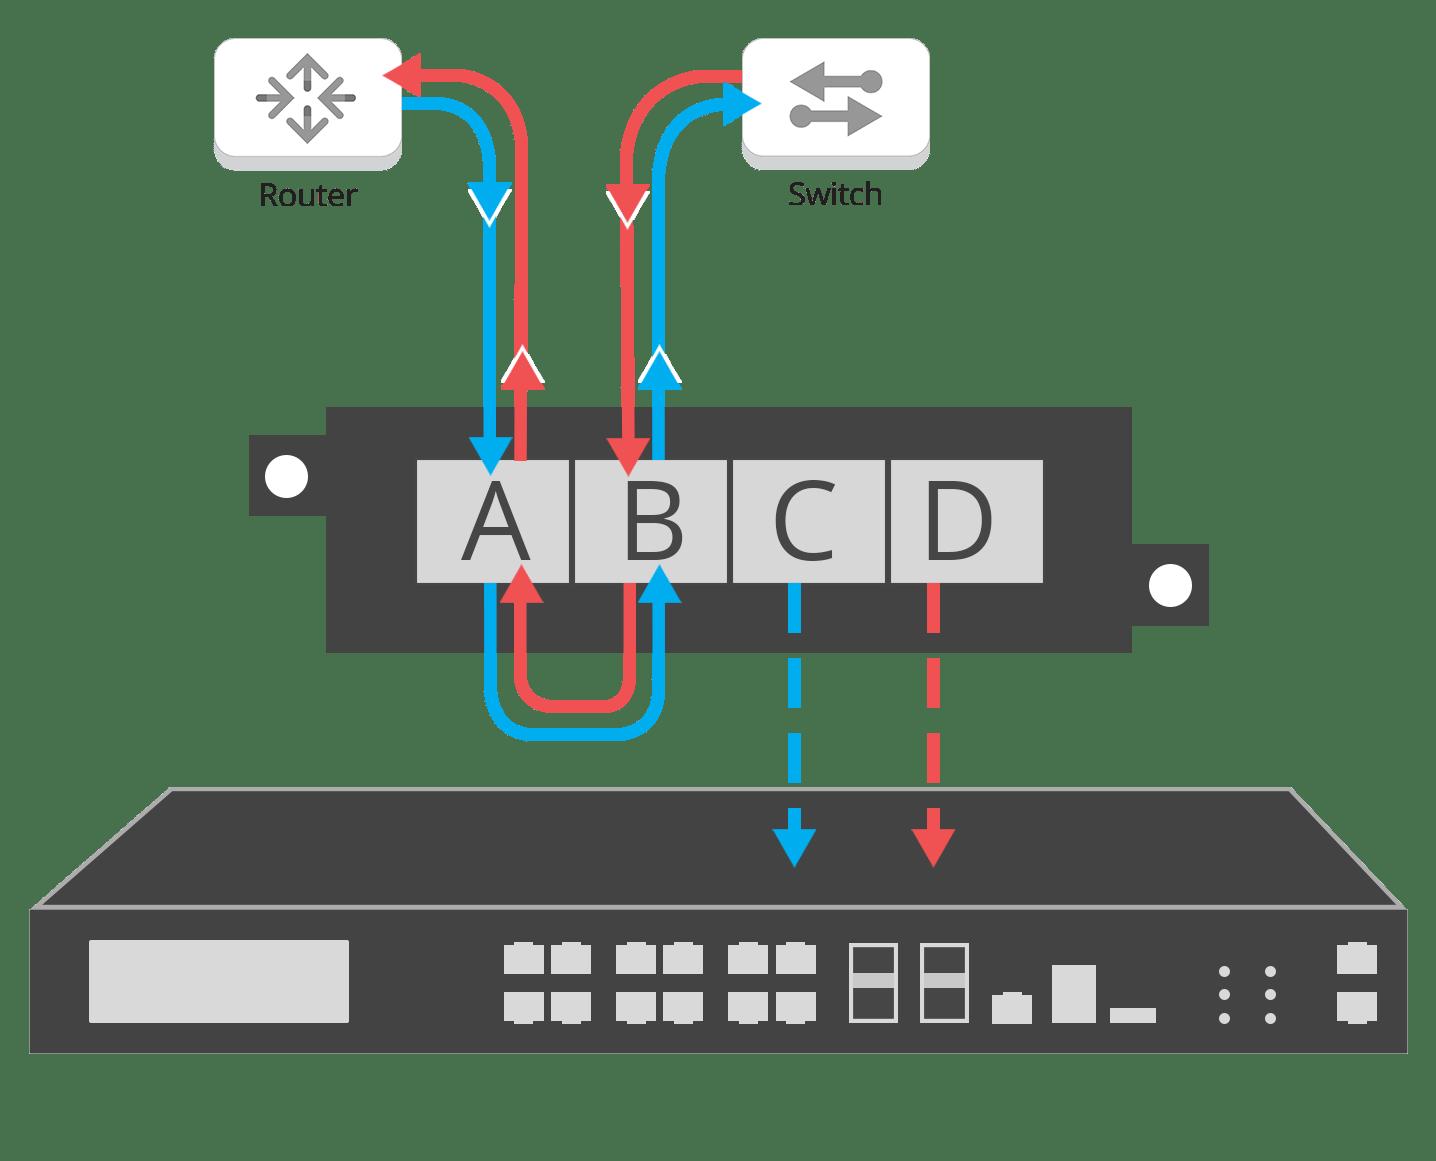 ball tap diagrams wiring diagram data today ball tap diagrams [ 1436 x 1161 Pixel ]